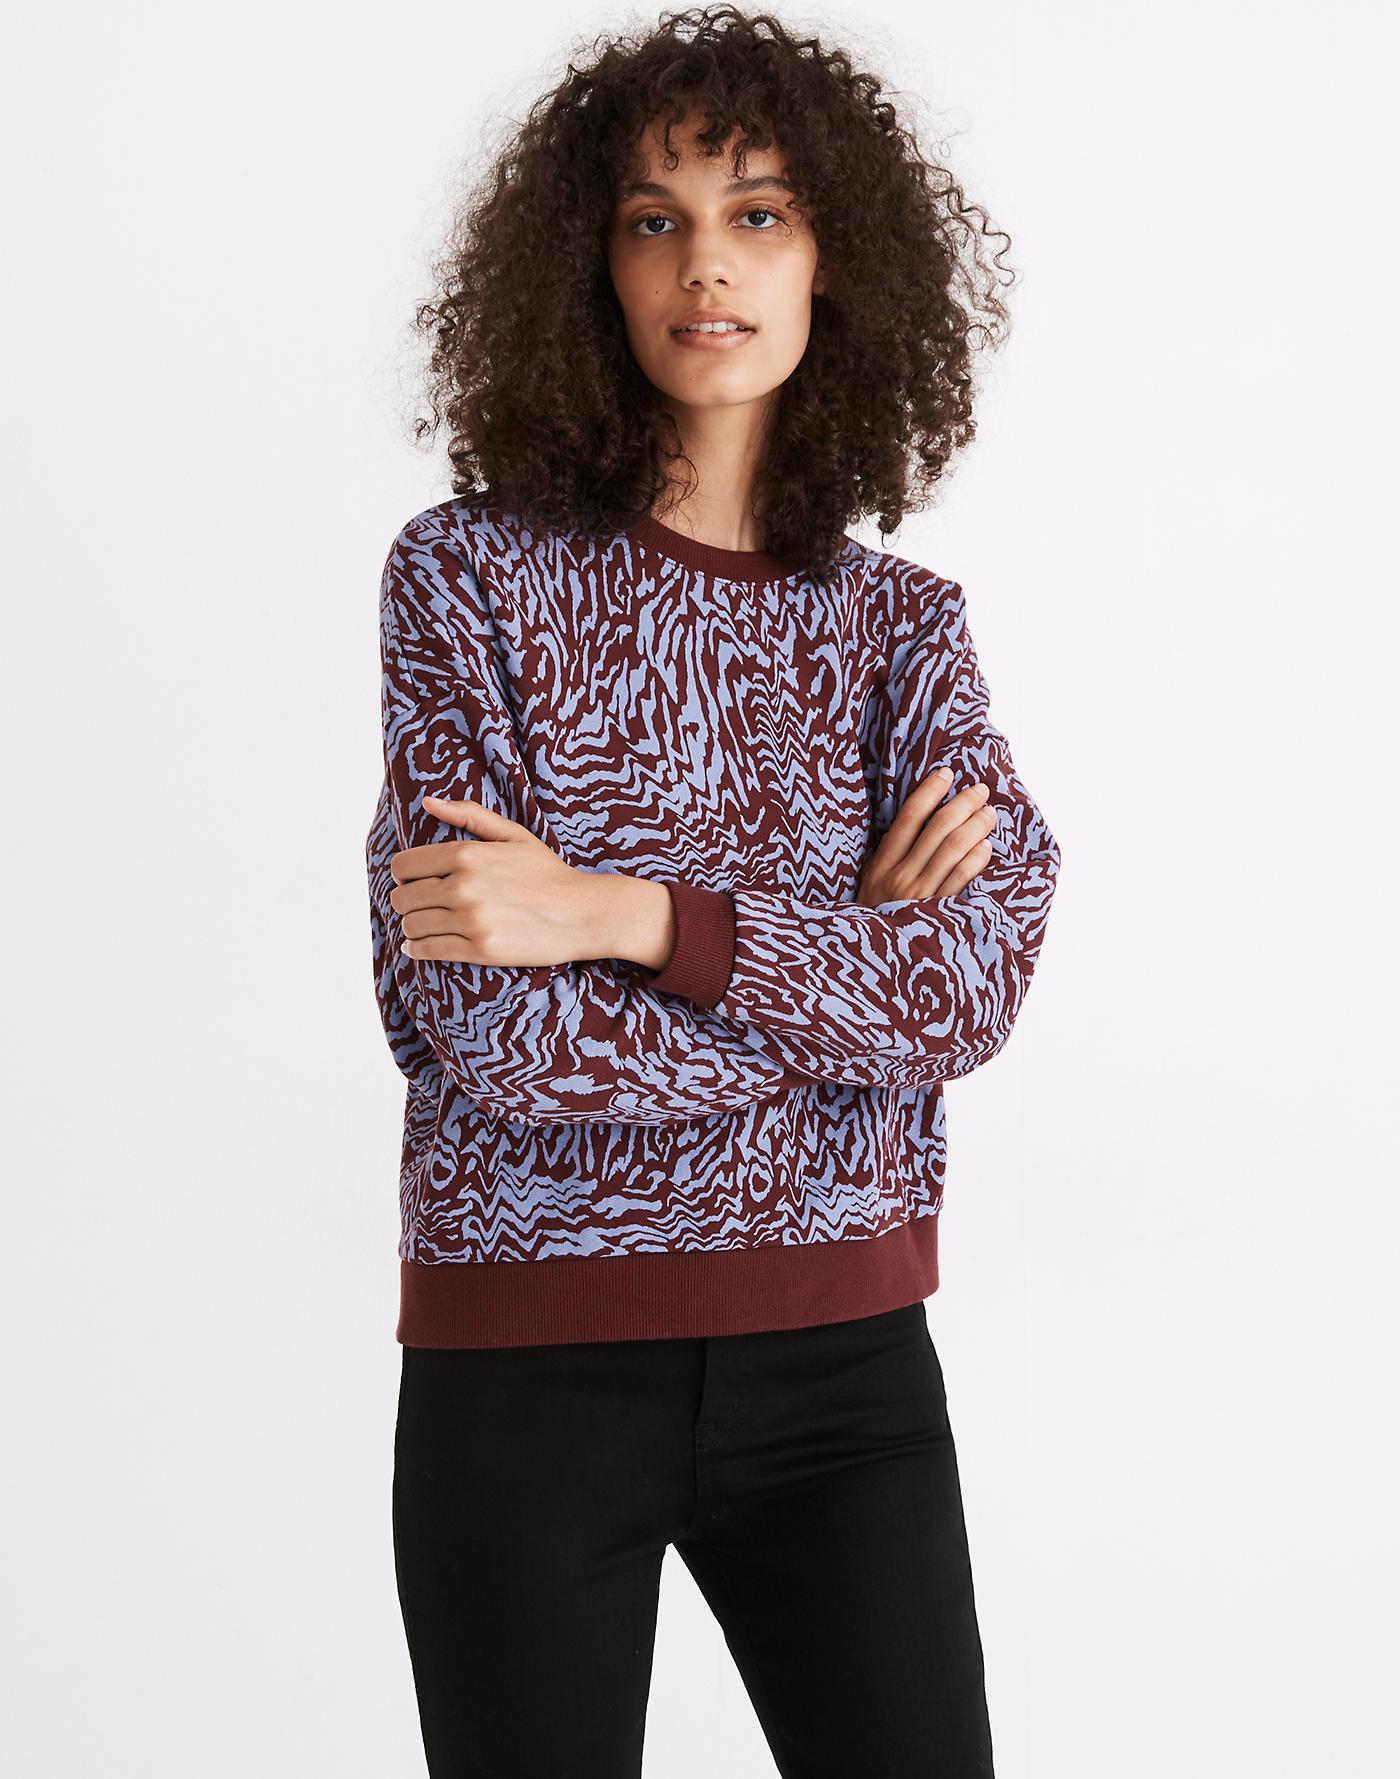 Model in the lavender and maroon zebra print sweatshirt